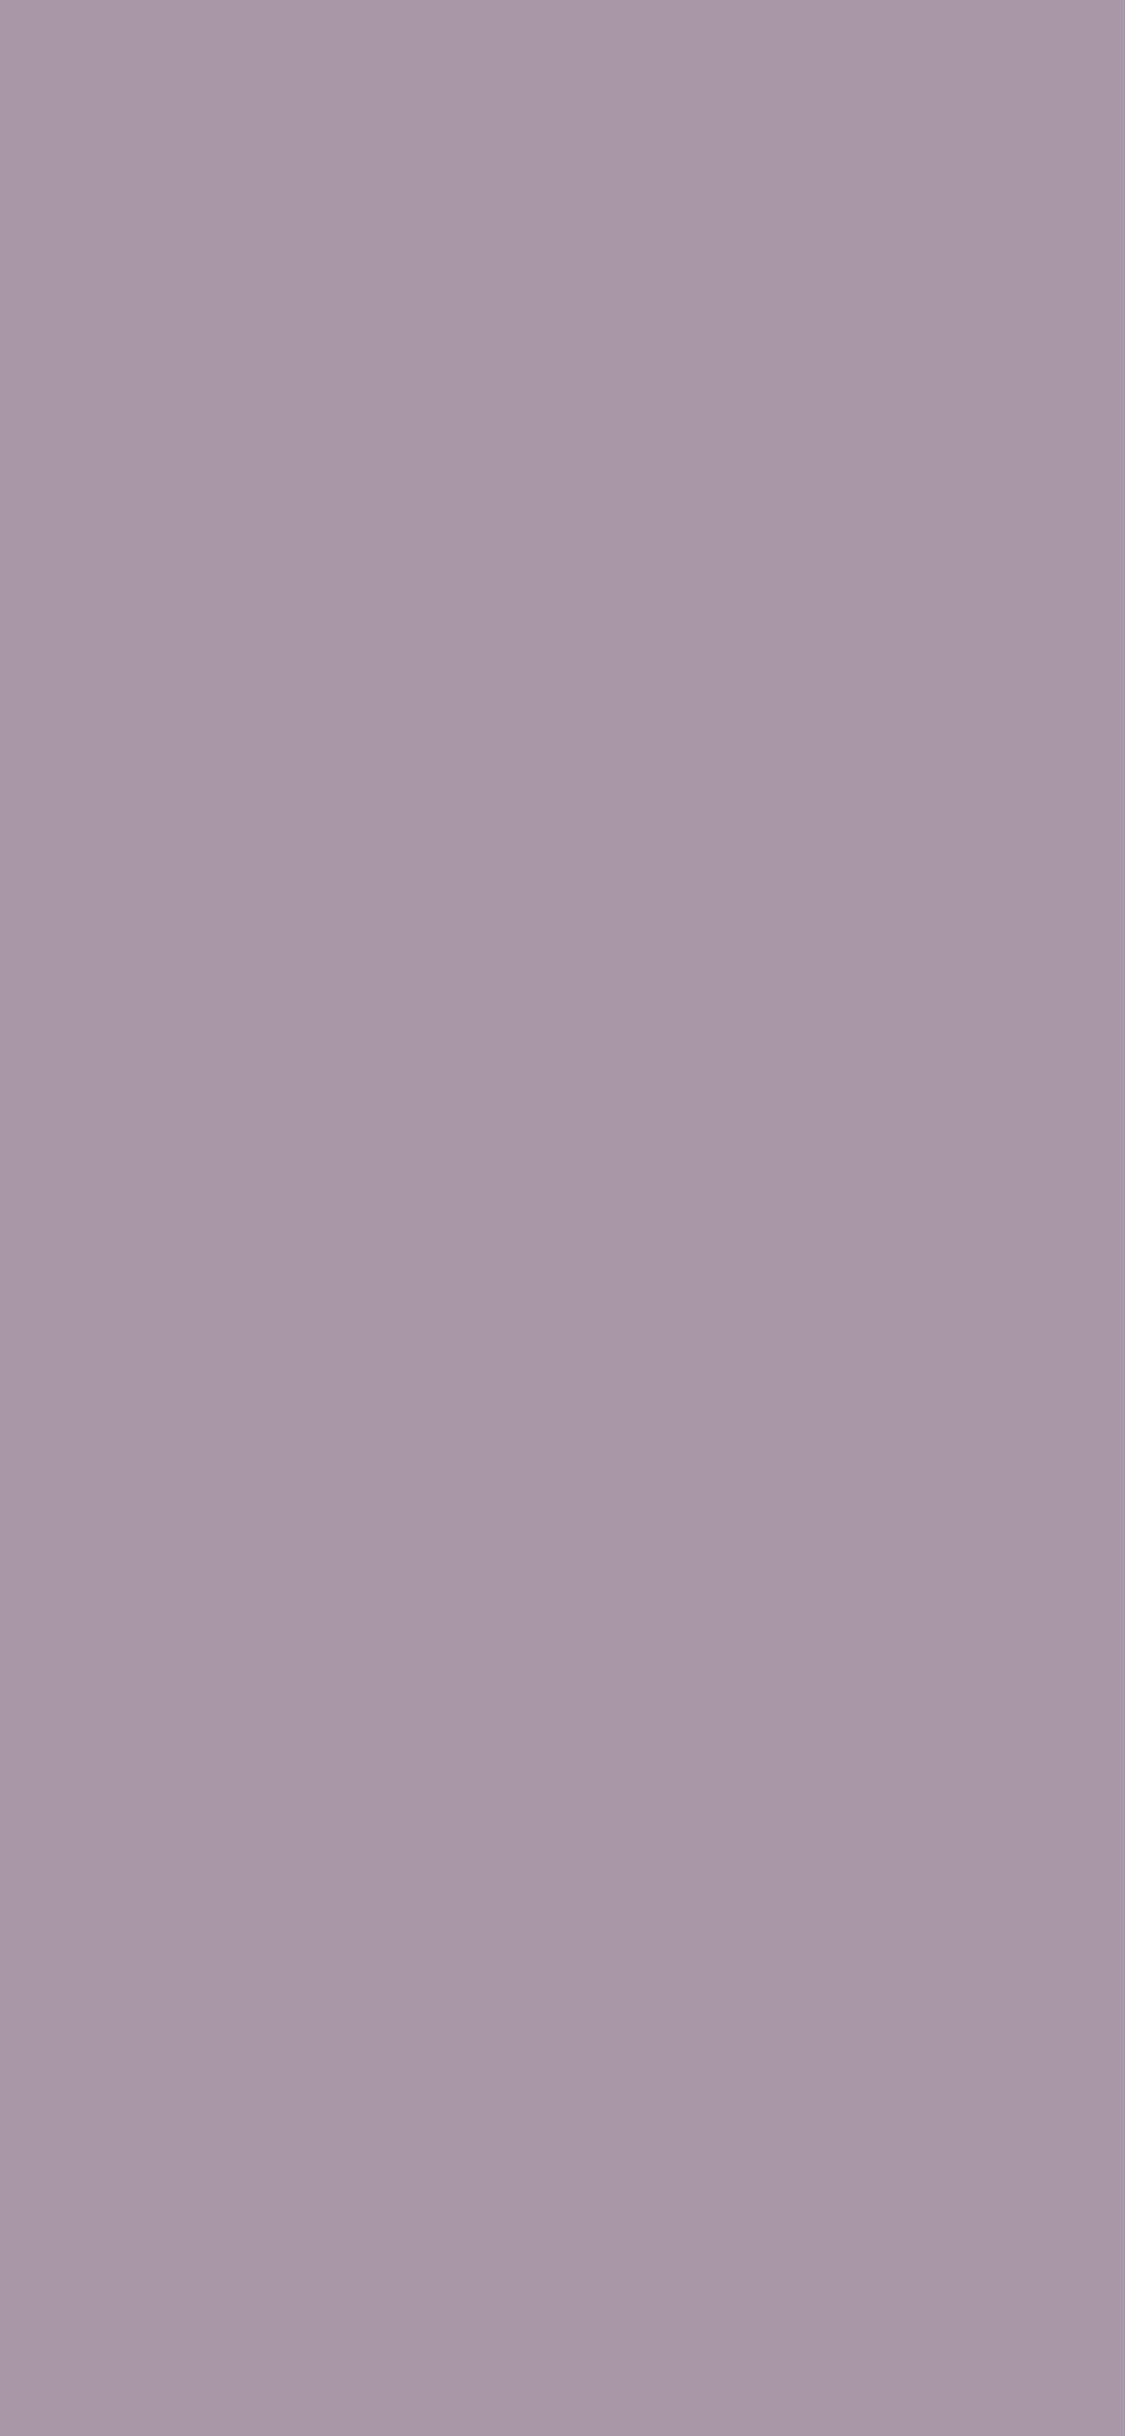 1125x2436 Rose Quartz Solid Color Background